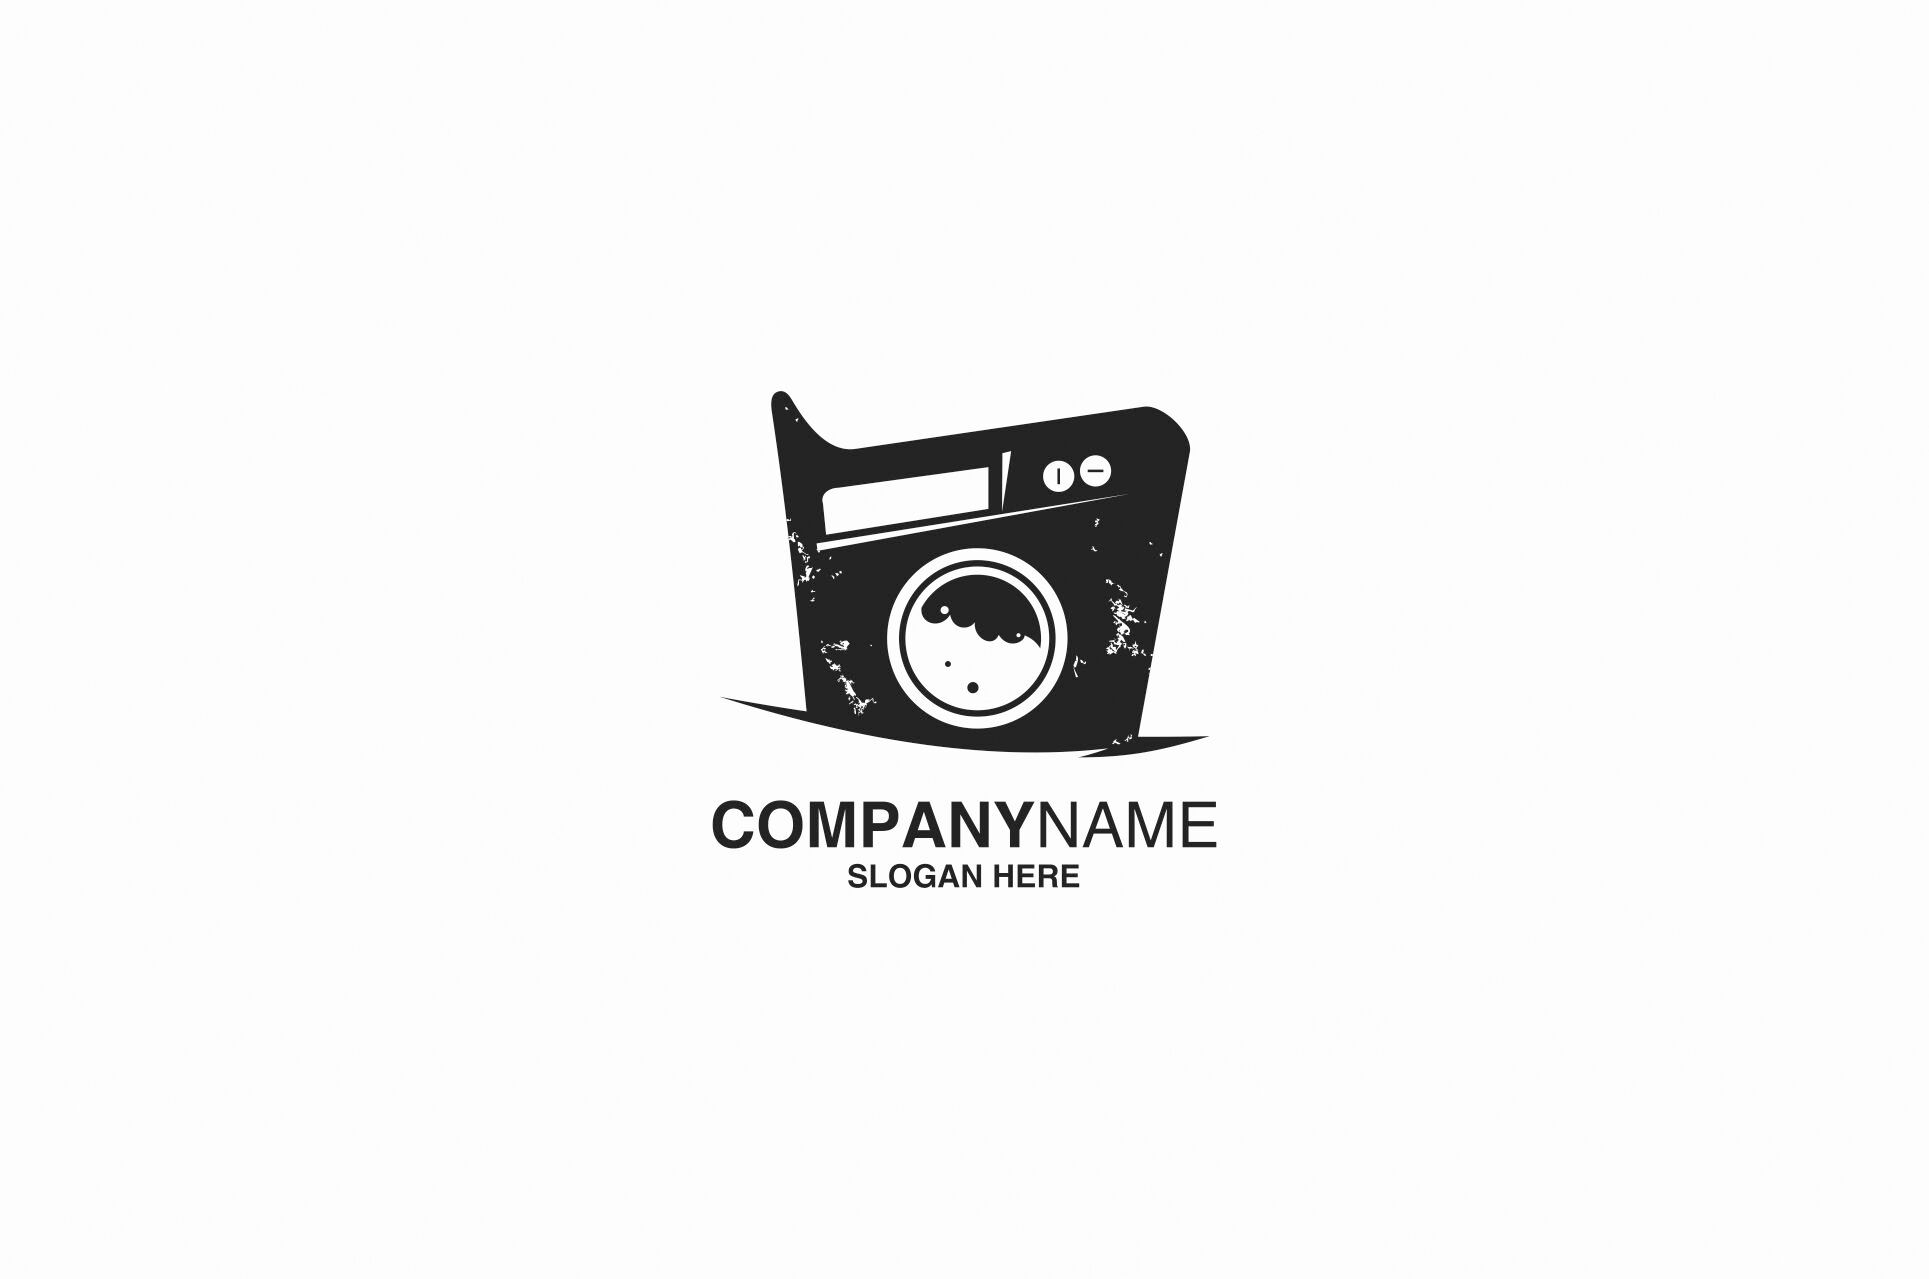 laundry logo design vector by ahsancomp studio thehungryjpeg com the hungry jpeg